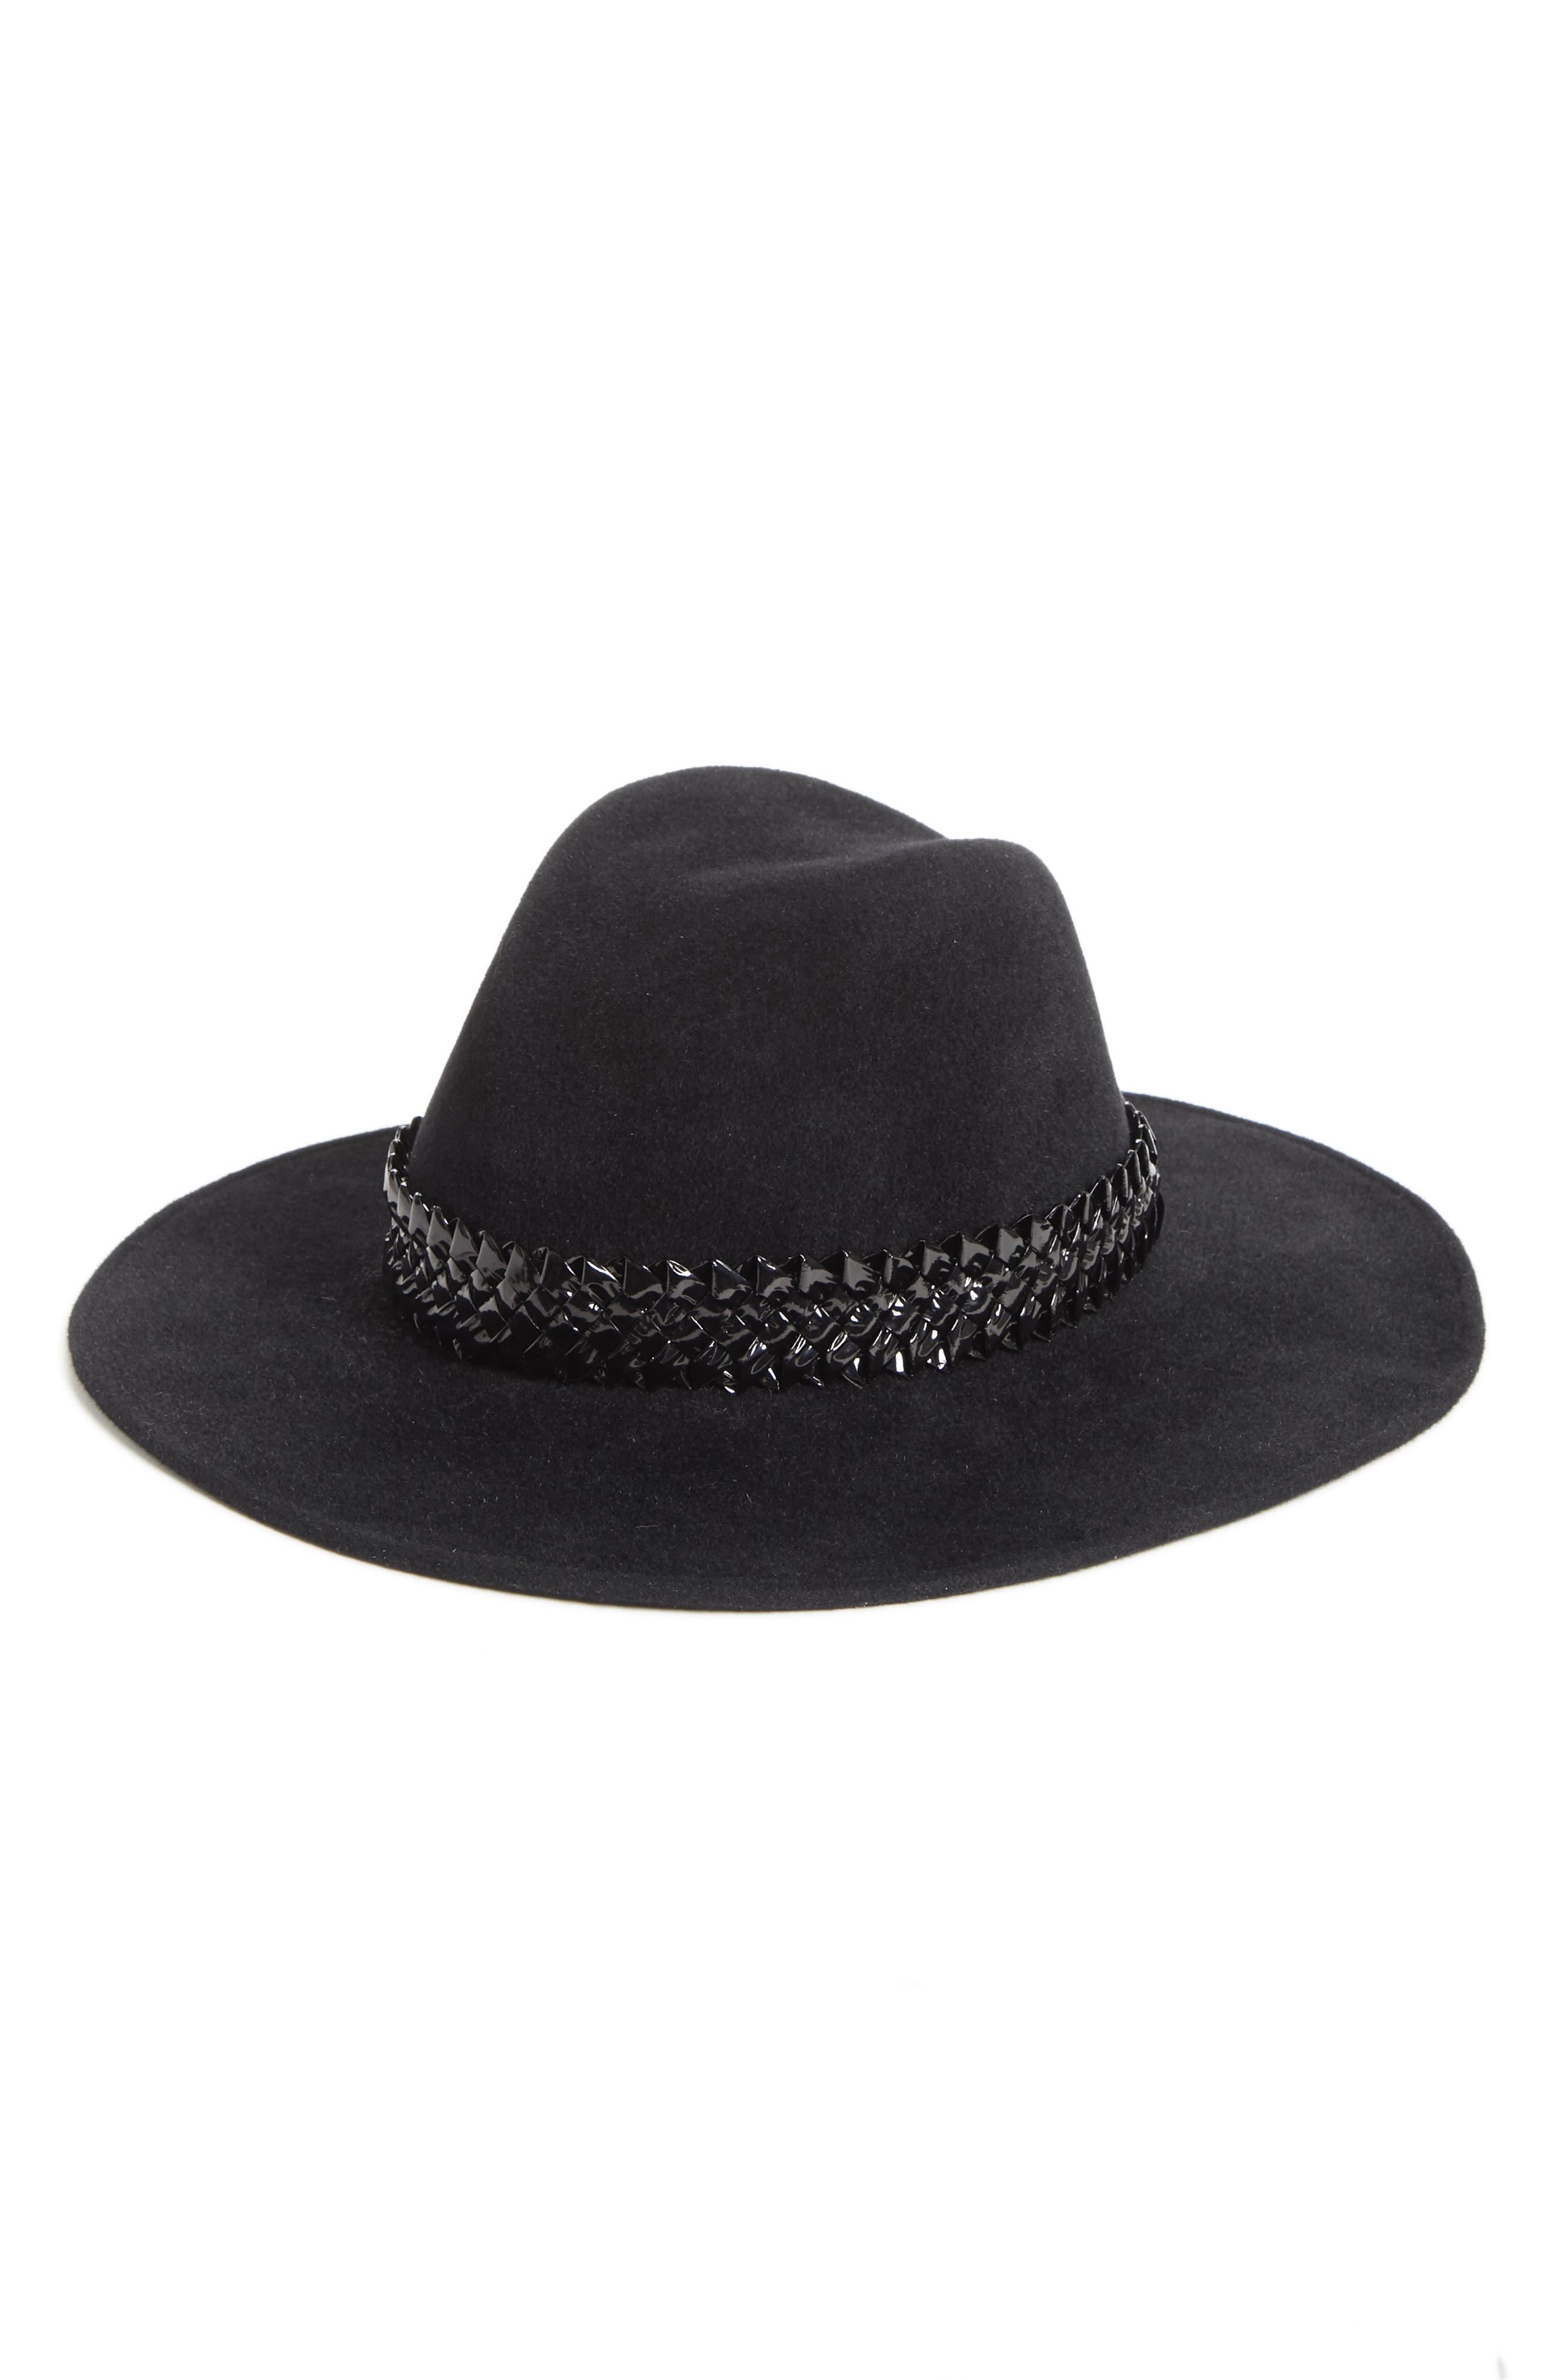 GIGI BURRIS MILLINERY JEANNIE RABBIT FUR FELT WIDE BRIM HAT - BLACK